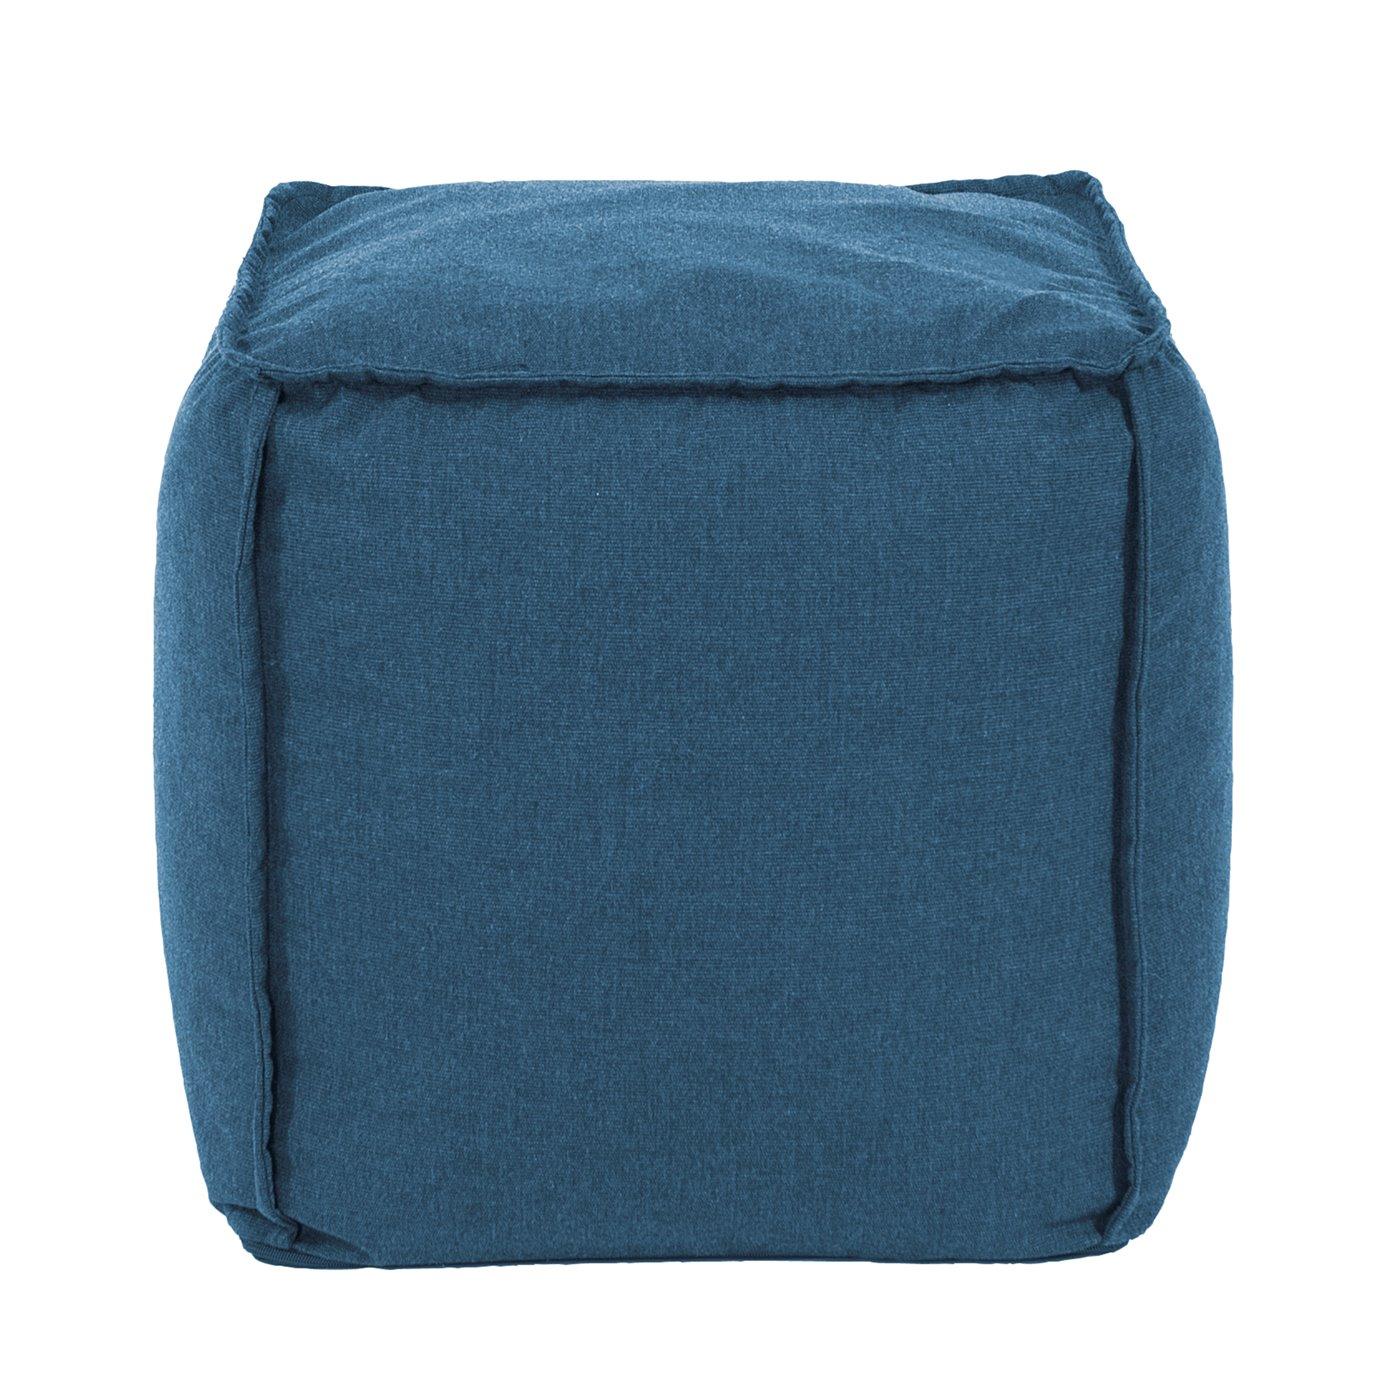 Howard Elliott Square Pouf Seascape Turquoise